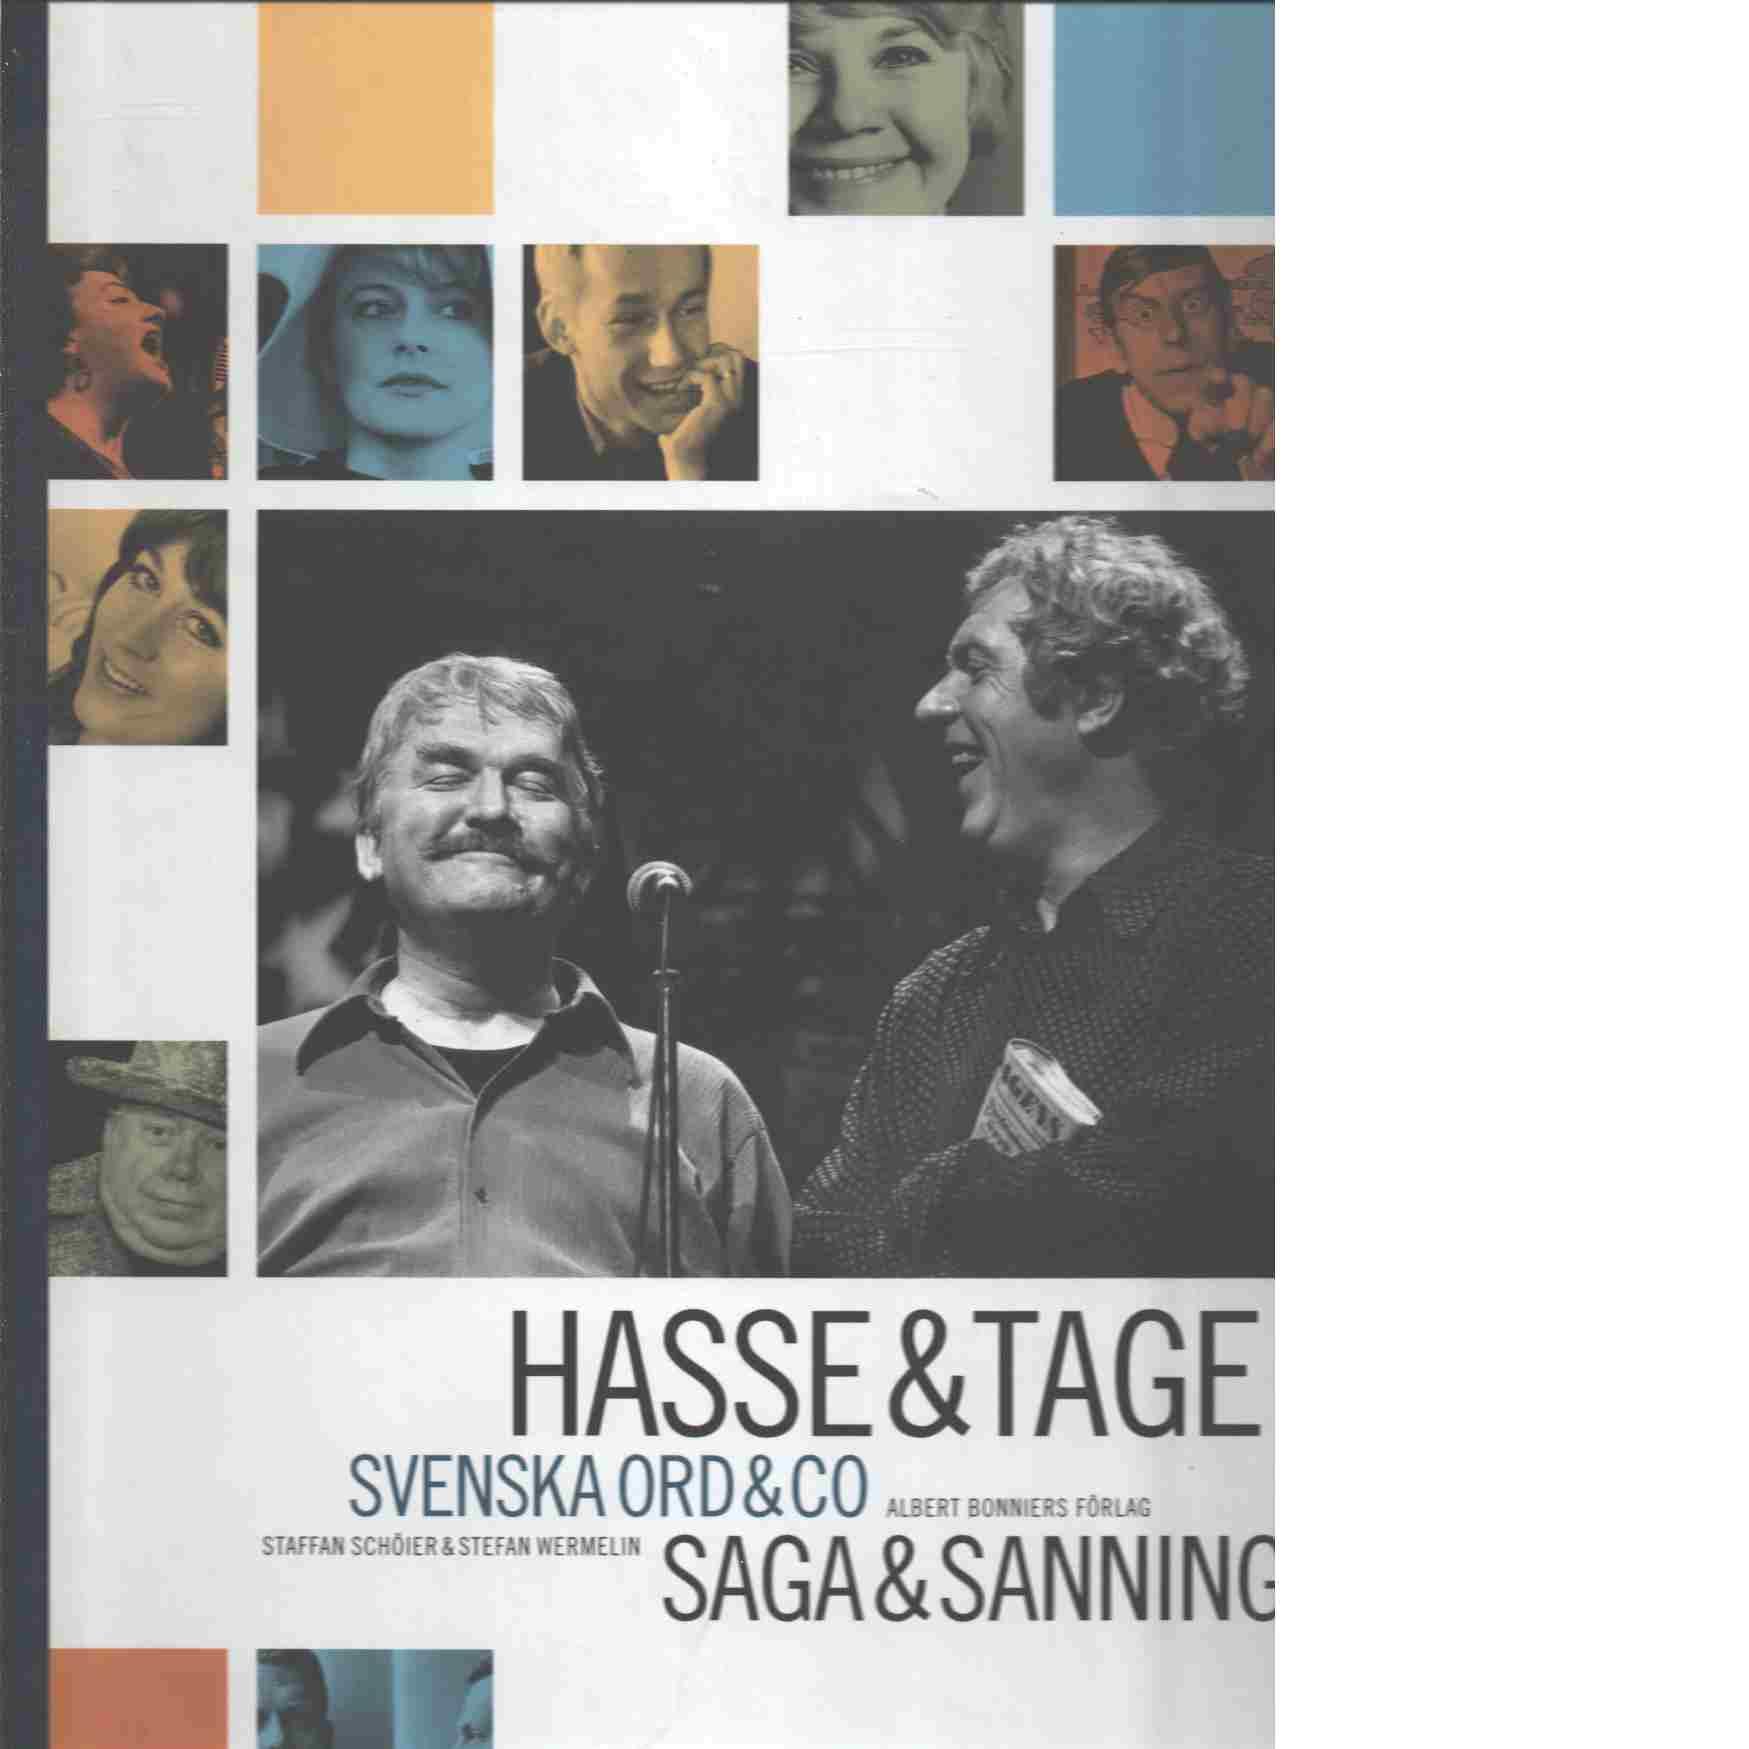 Hasse & Tage : Svenska ord & Co : saga & sanning - Schöier, Staffan och Wermelin, Stefan